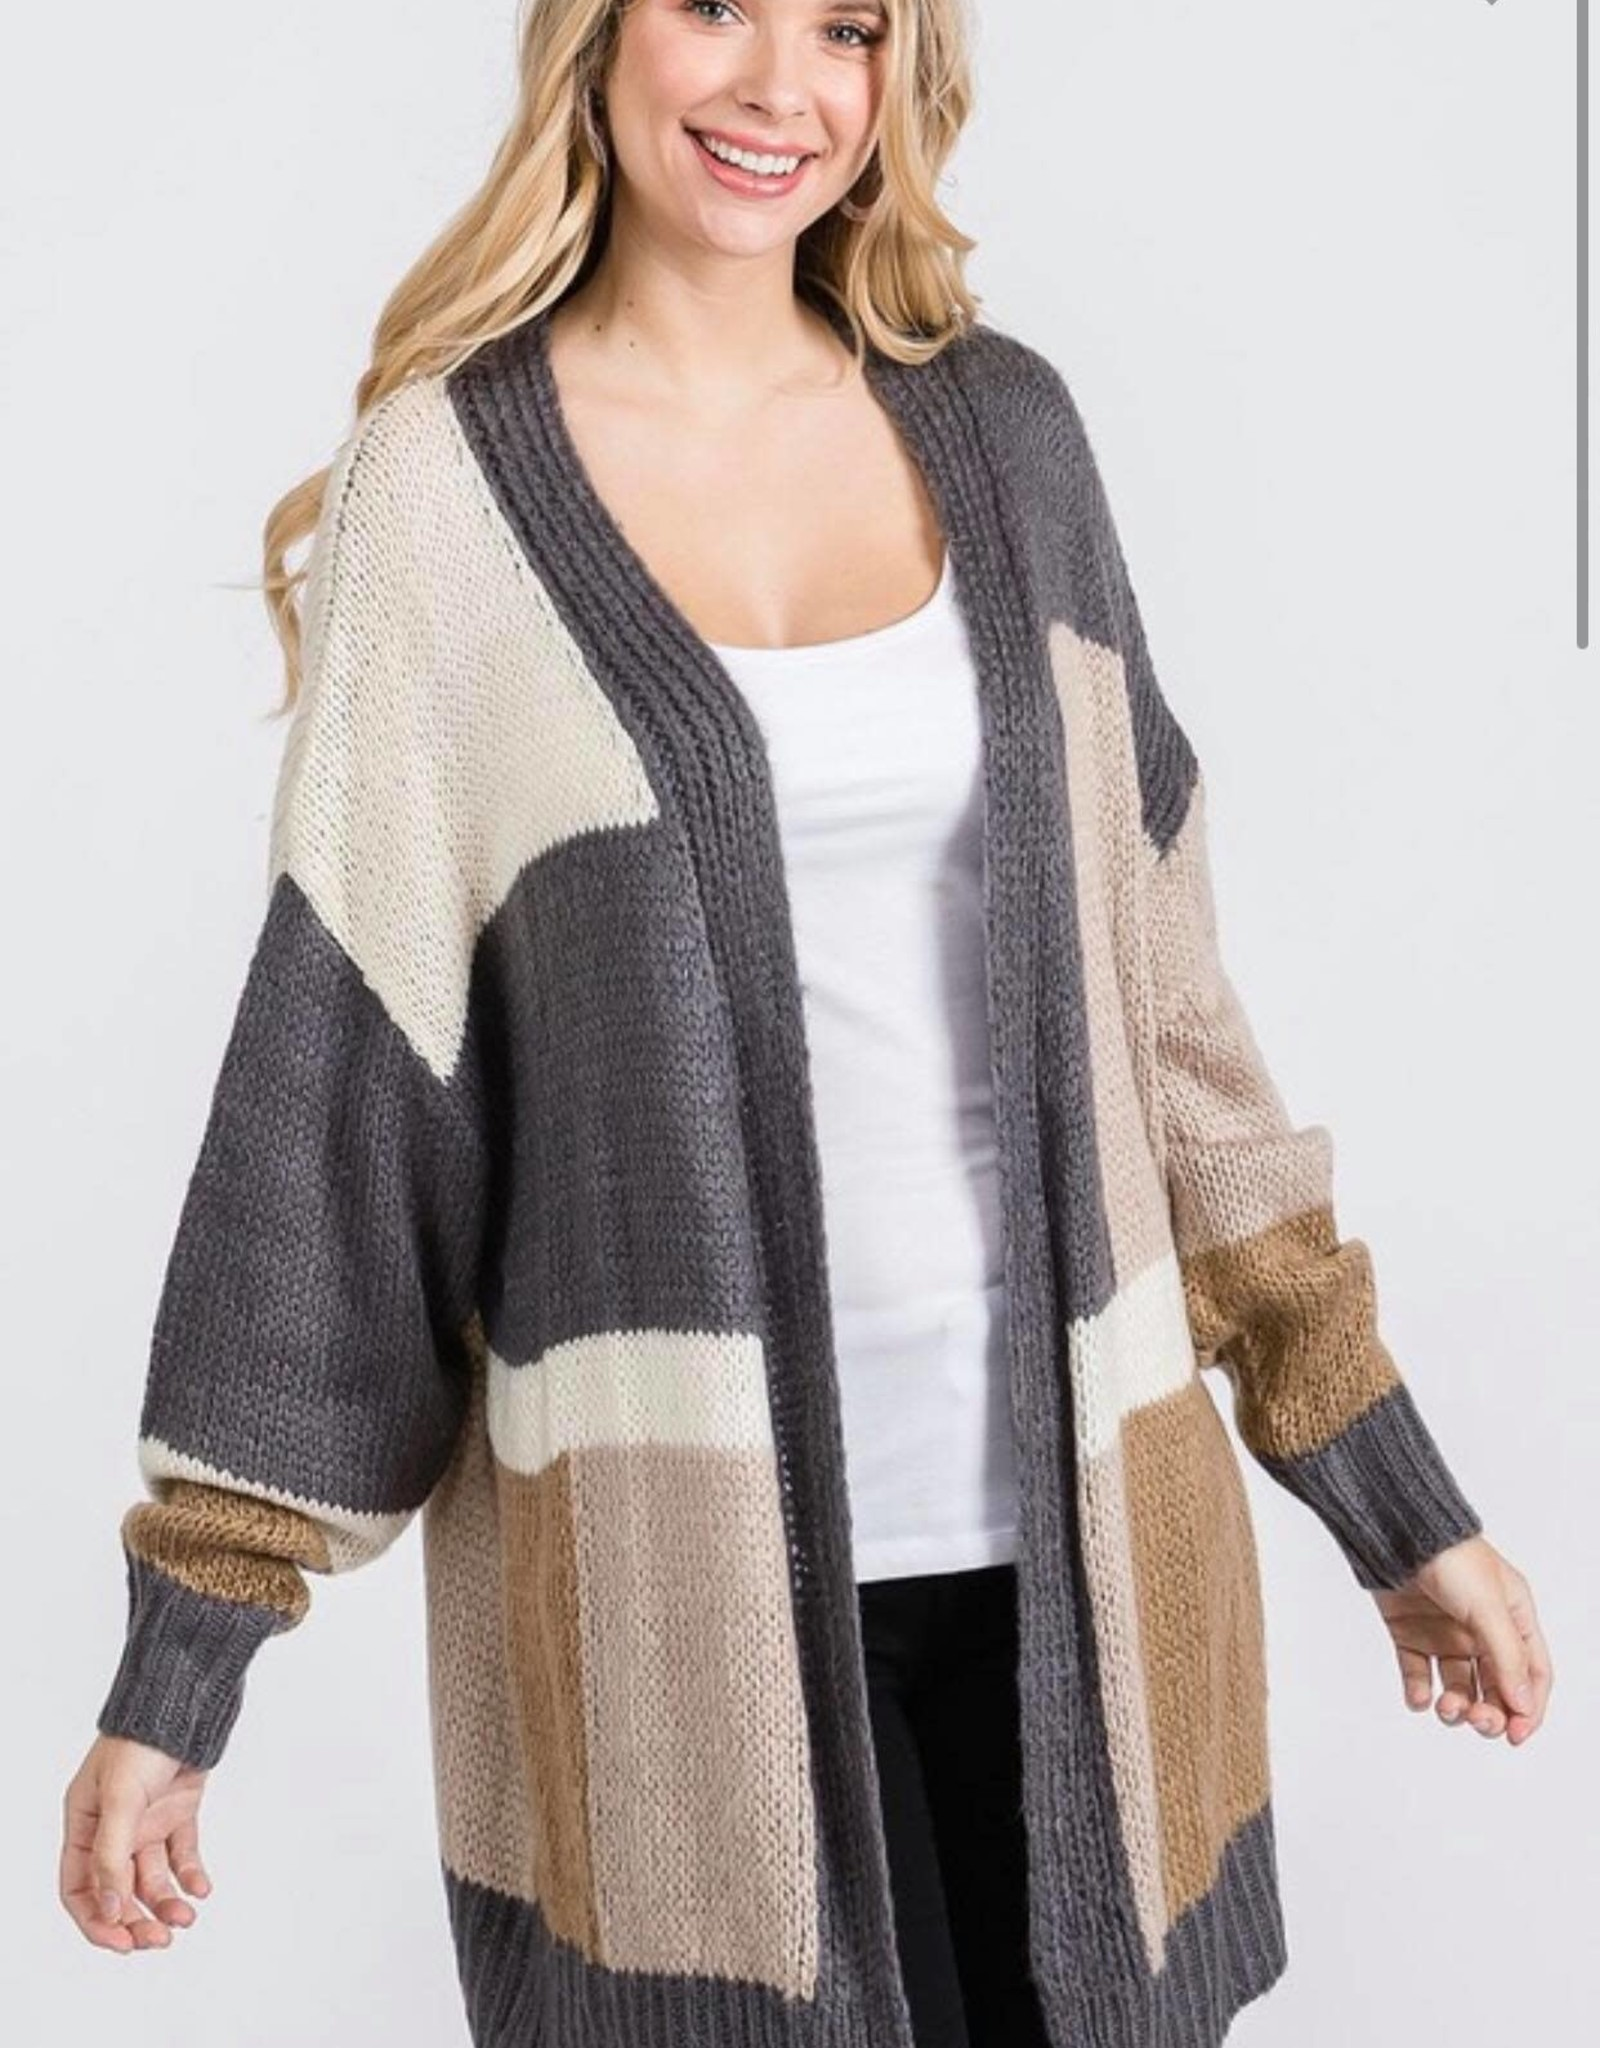 Charcoal Oversized Cardigan